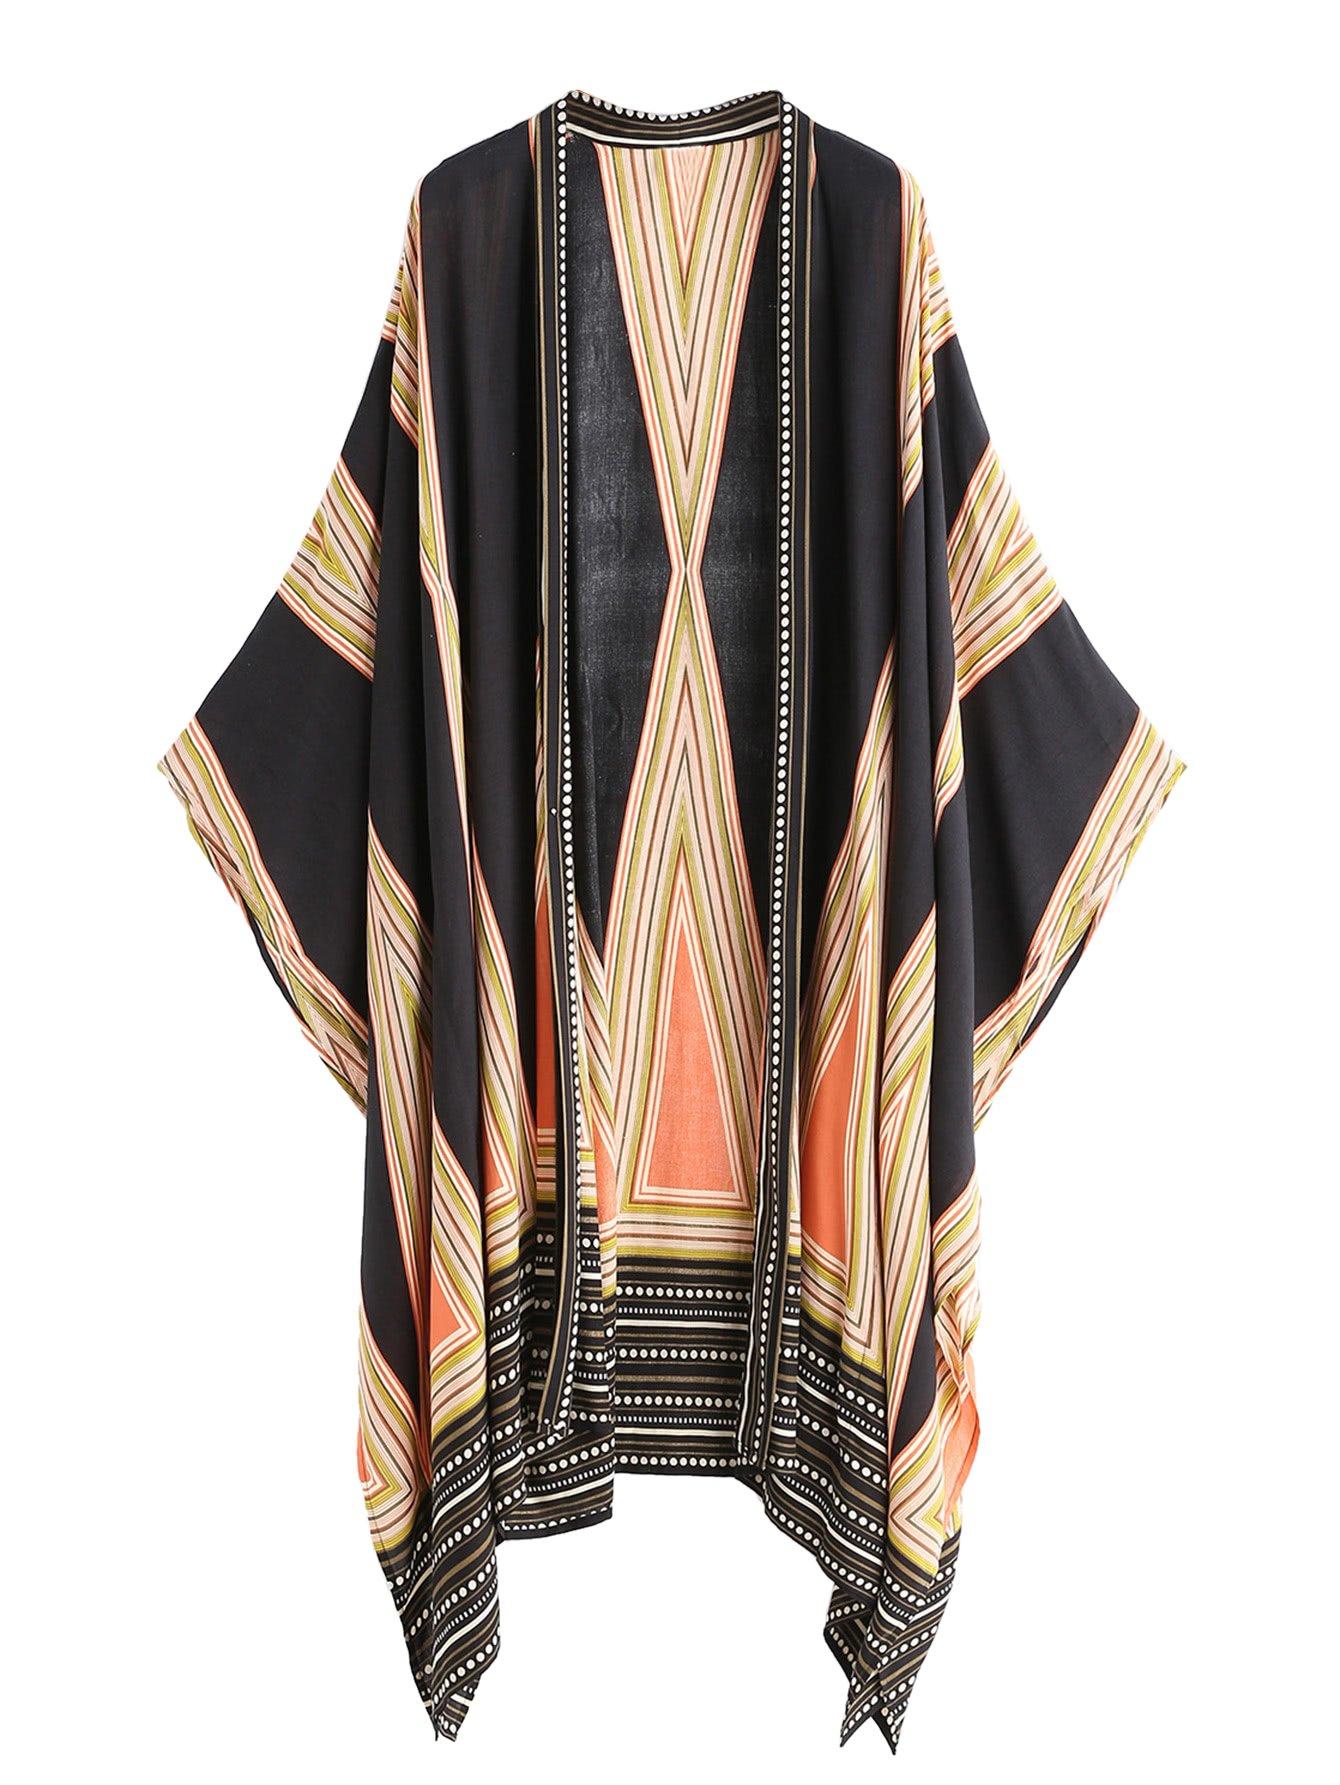 SweatyRocks Women Kimono Vintage Floral Beach Cover Up Swimwear Multicolor #5 One Size